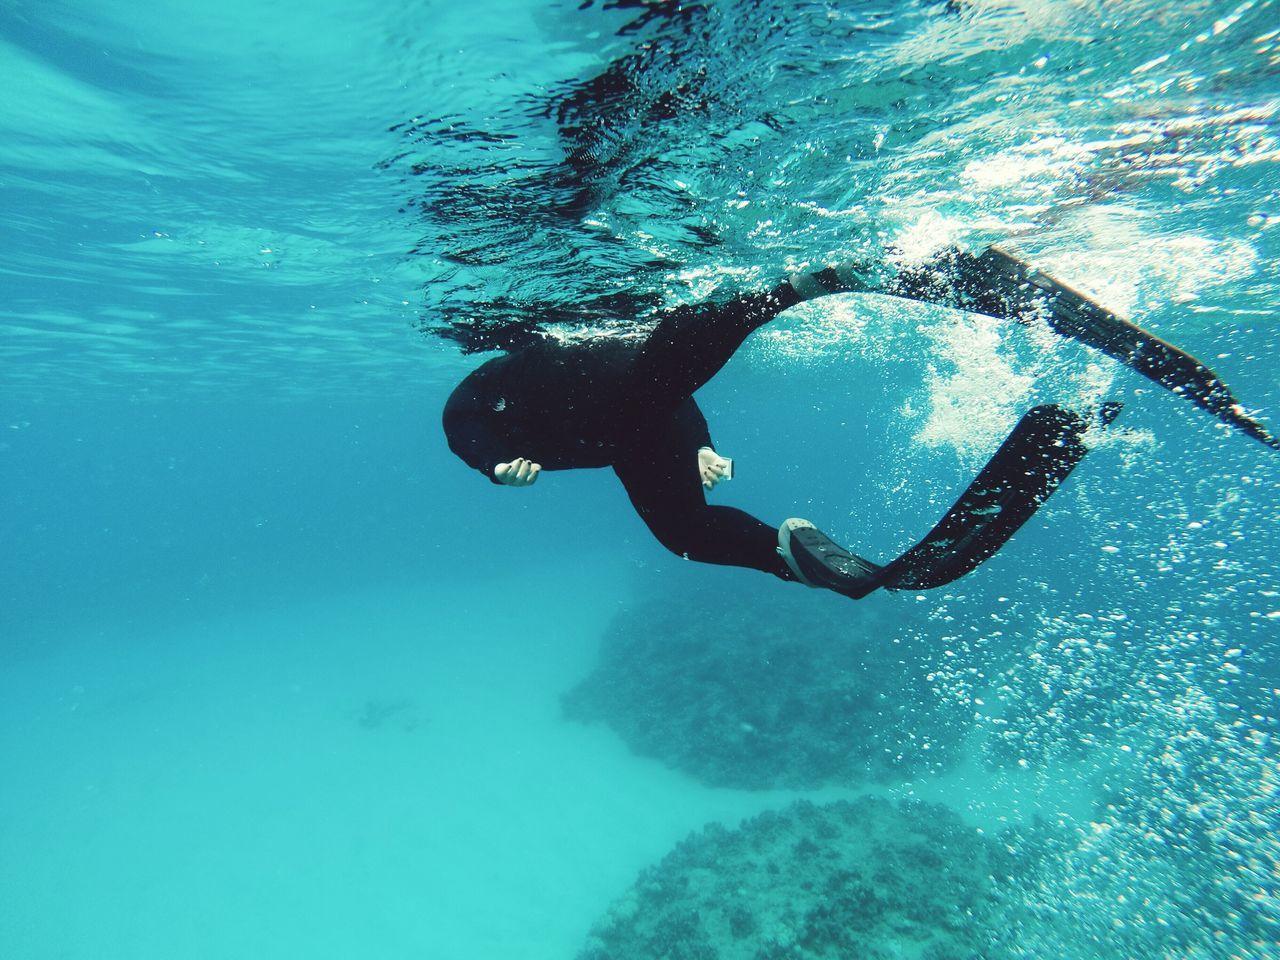 Mermaid life. Real People Underwater Freediving Fins Cressi (null)UnderSea Hawaii Hawaii Life Gopro Ocean Photography Fresh On Market 2017